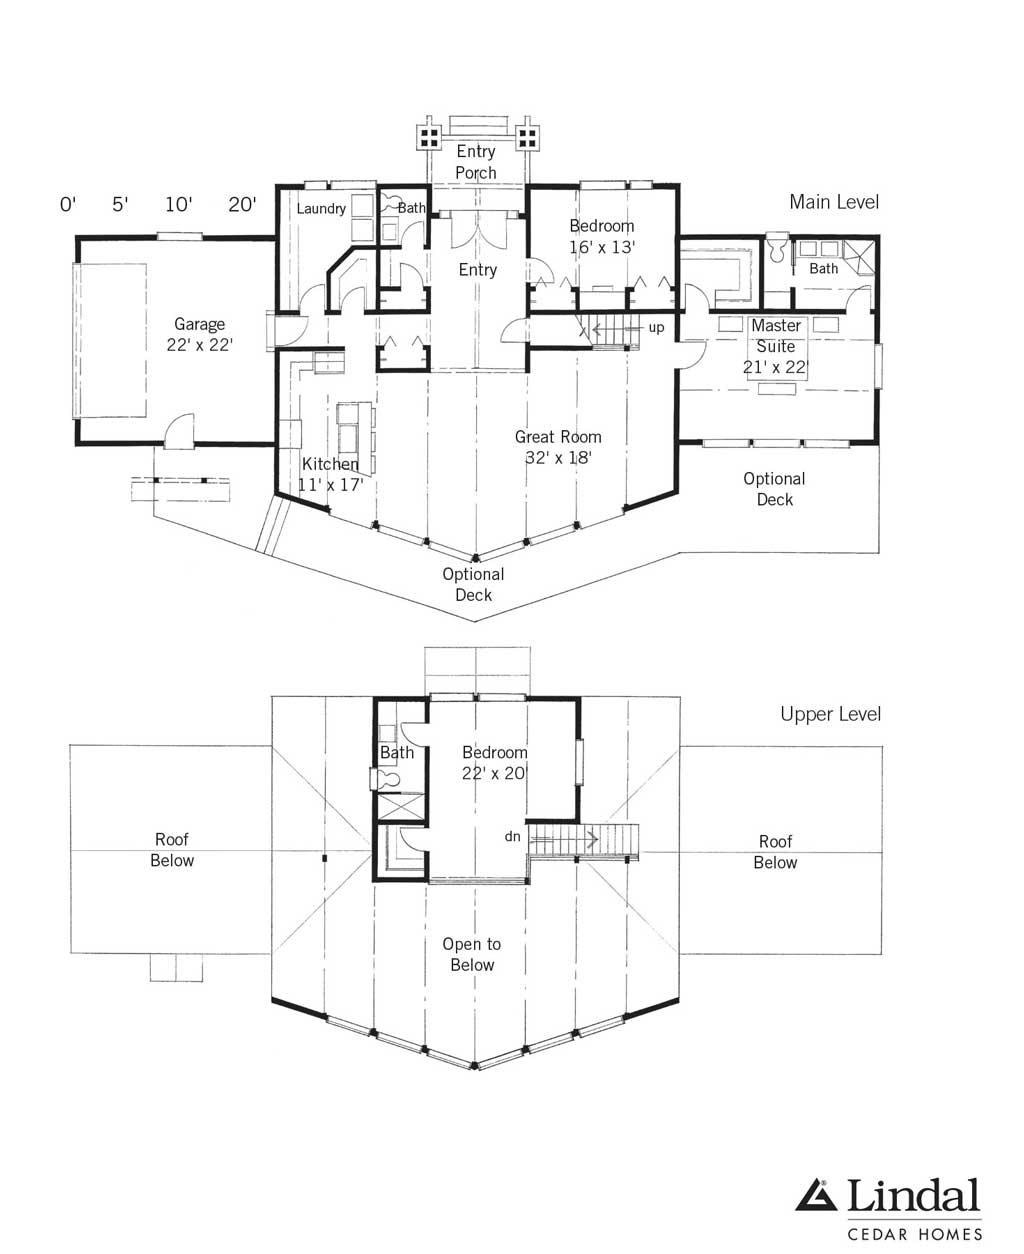 Summit star edgeport home design lindal cedar homes classic for Lindal homes floor plans